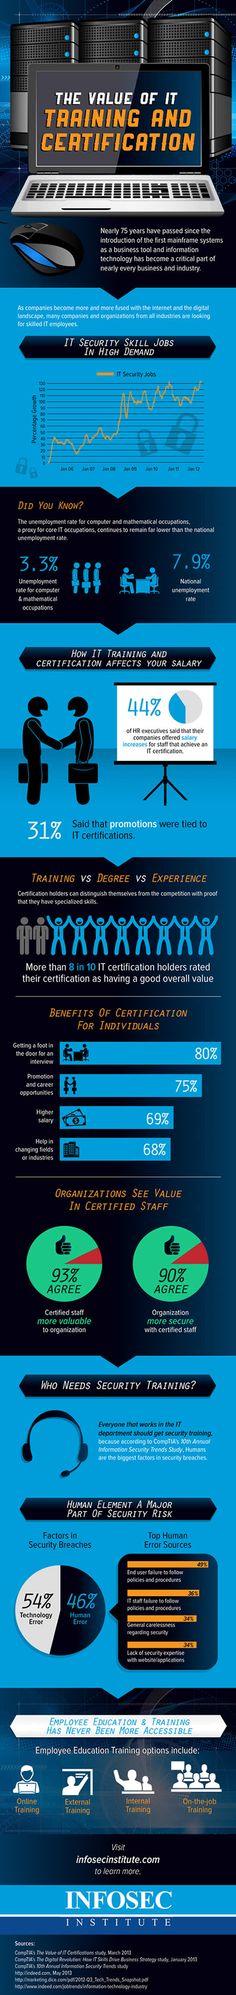 value of IT Training